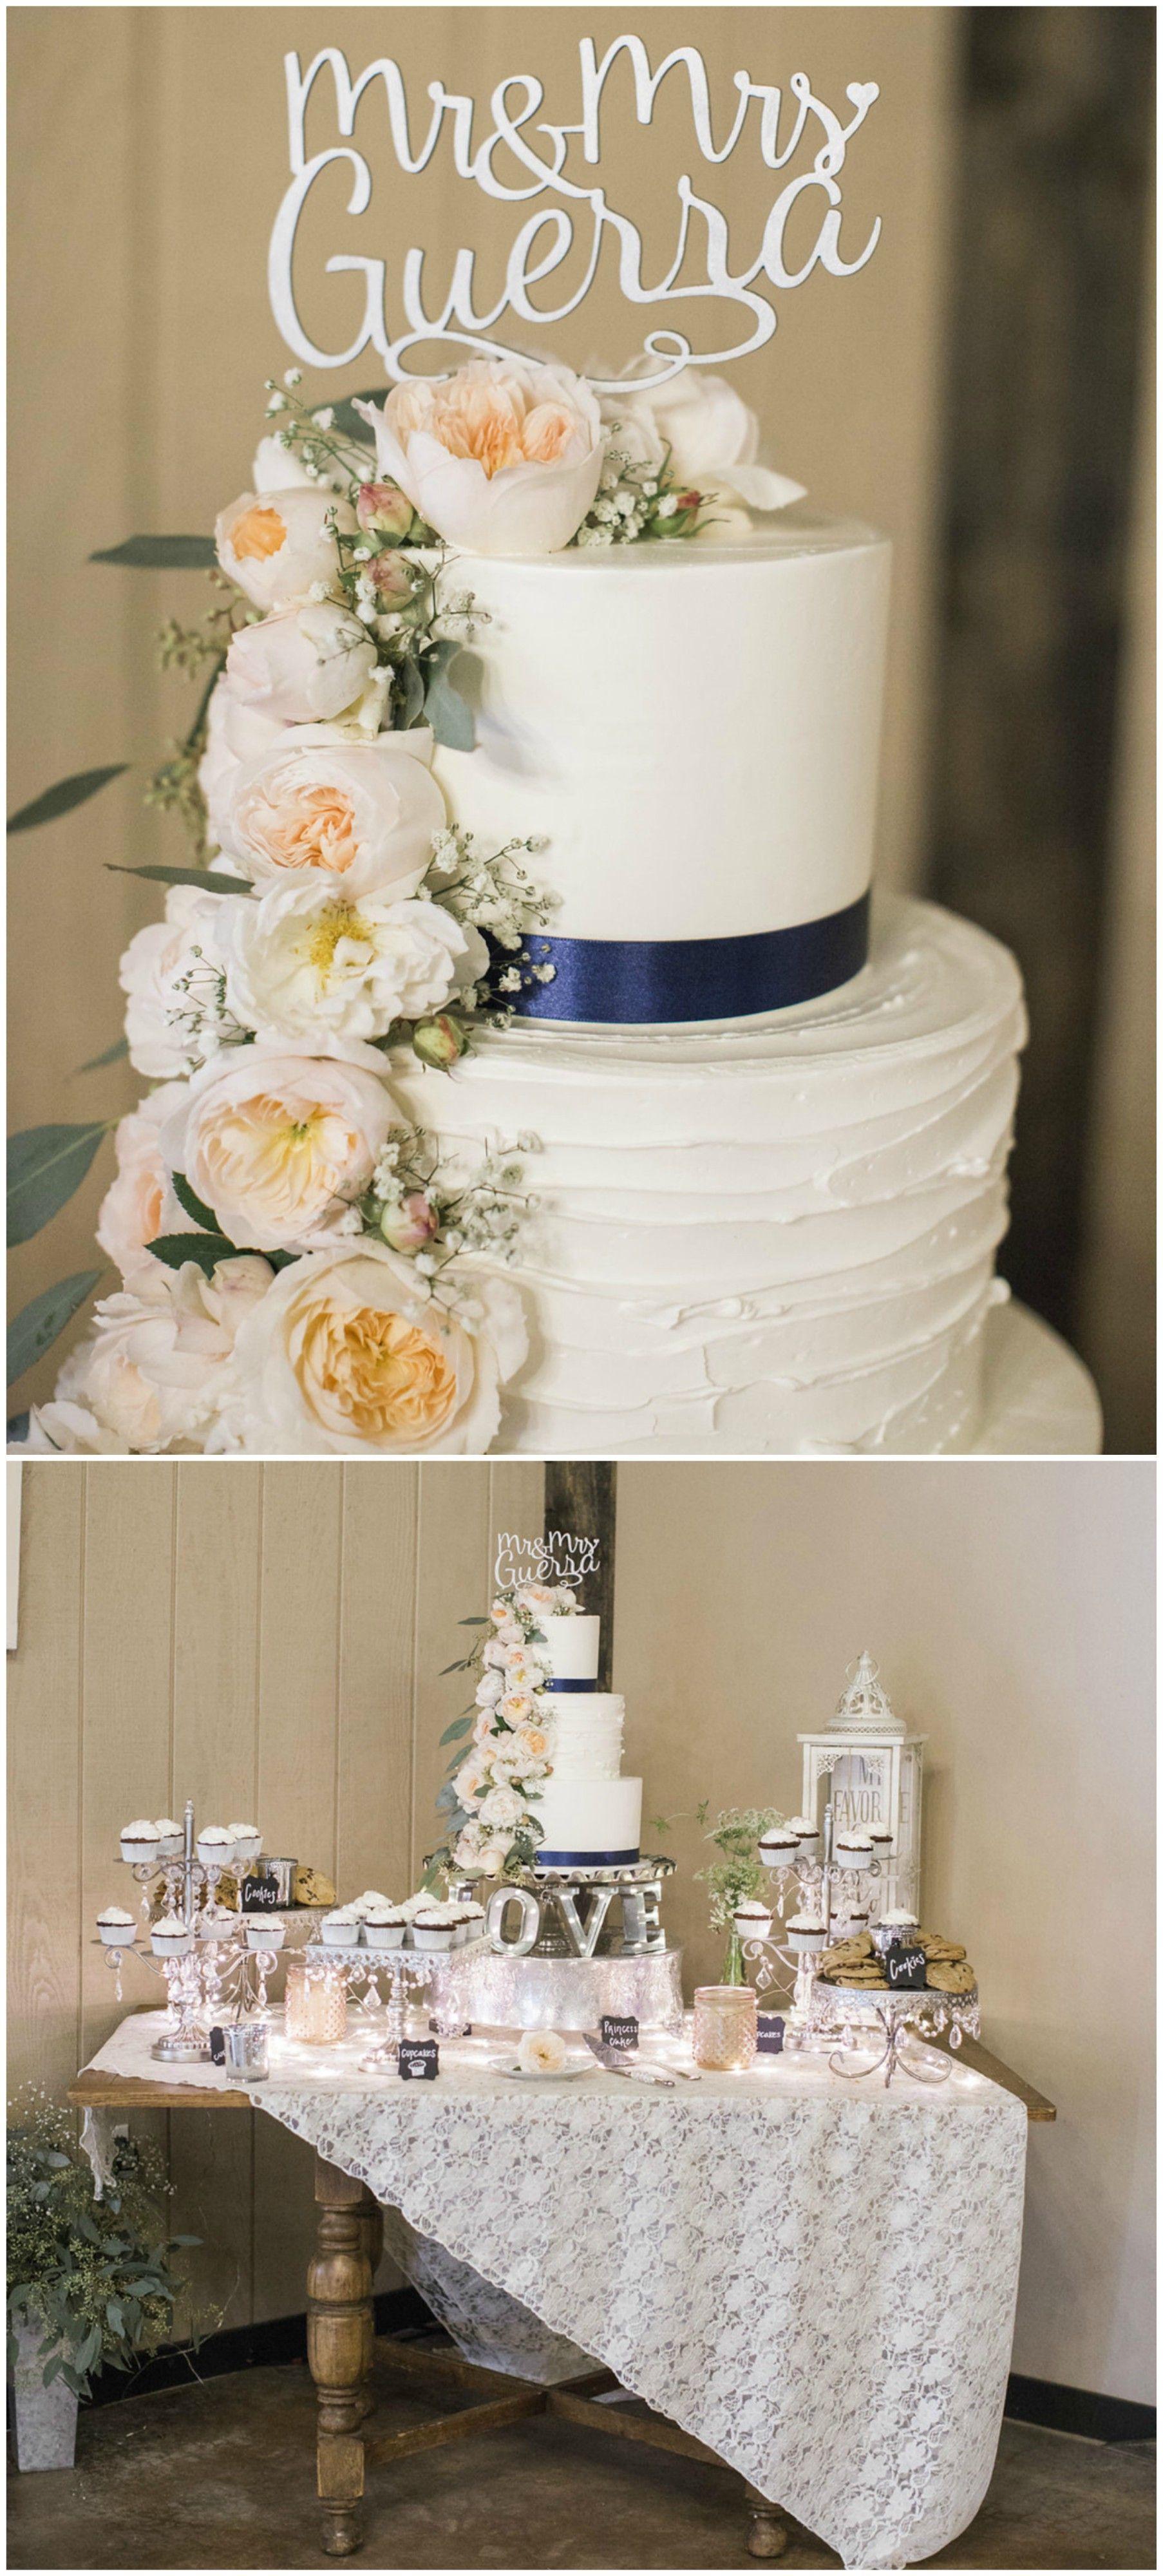 The Smarter Way to Wed | Pinterest | White wedding cakes, Wedding ...